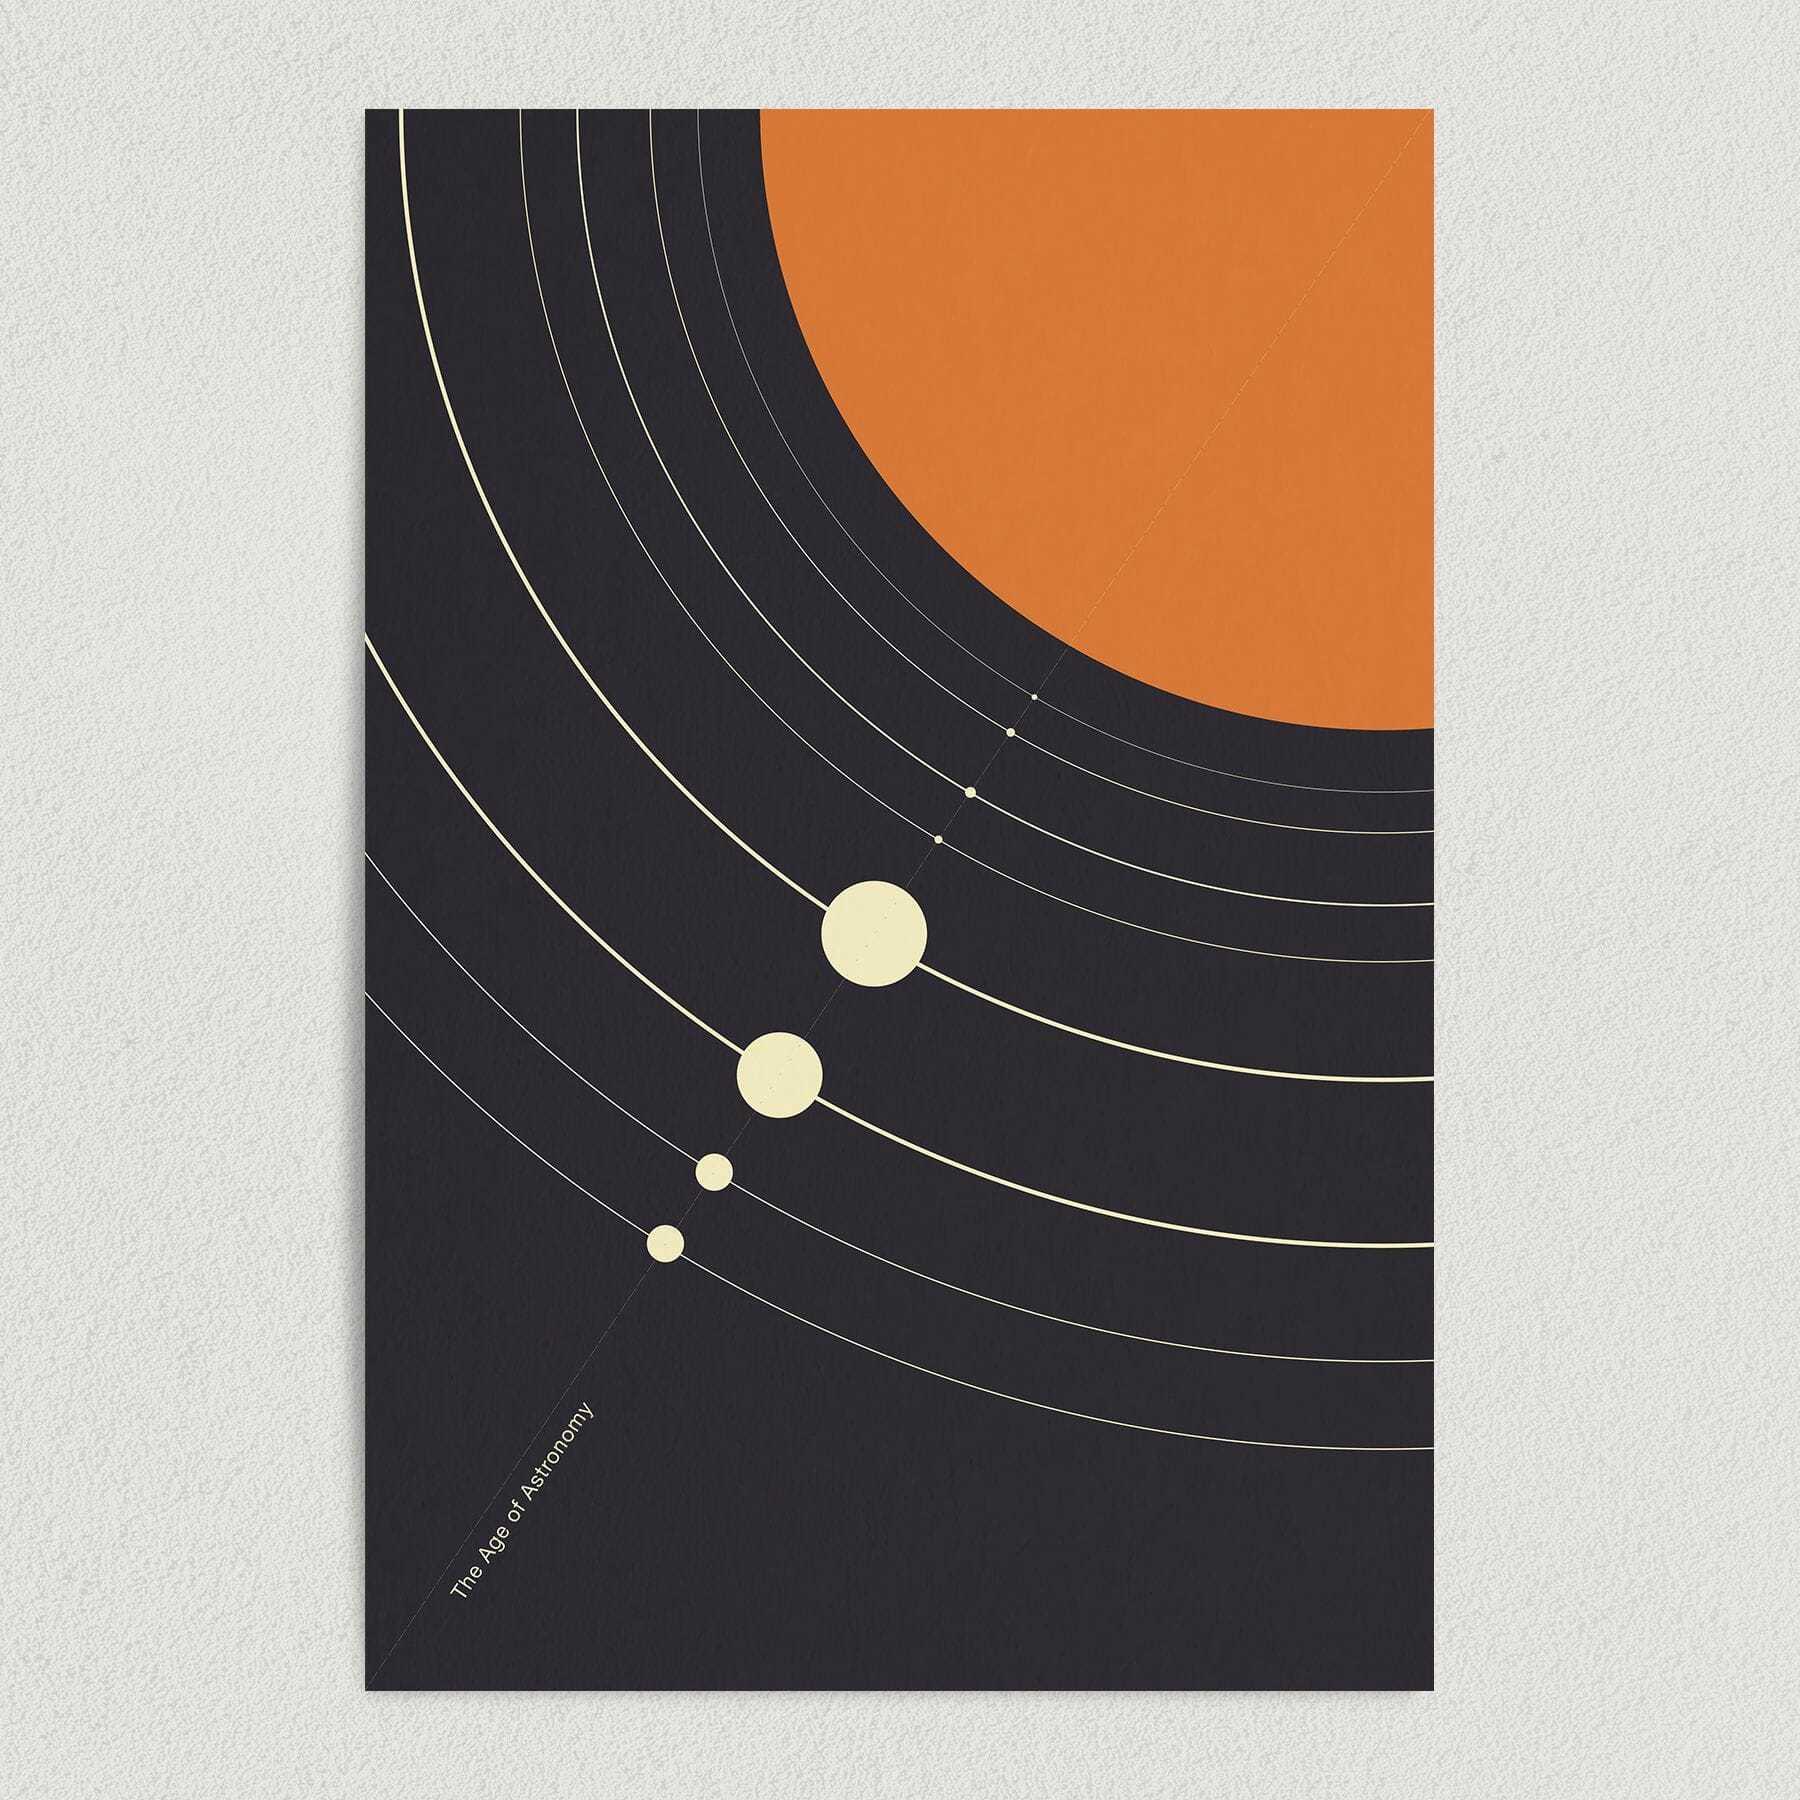 Age of Astronomy Space Orbit Art Print Poster S1100